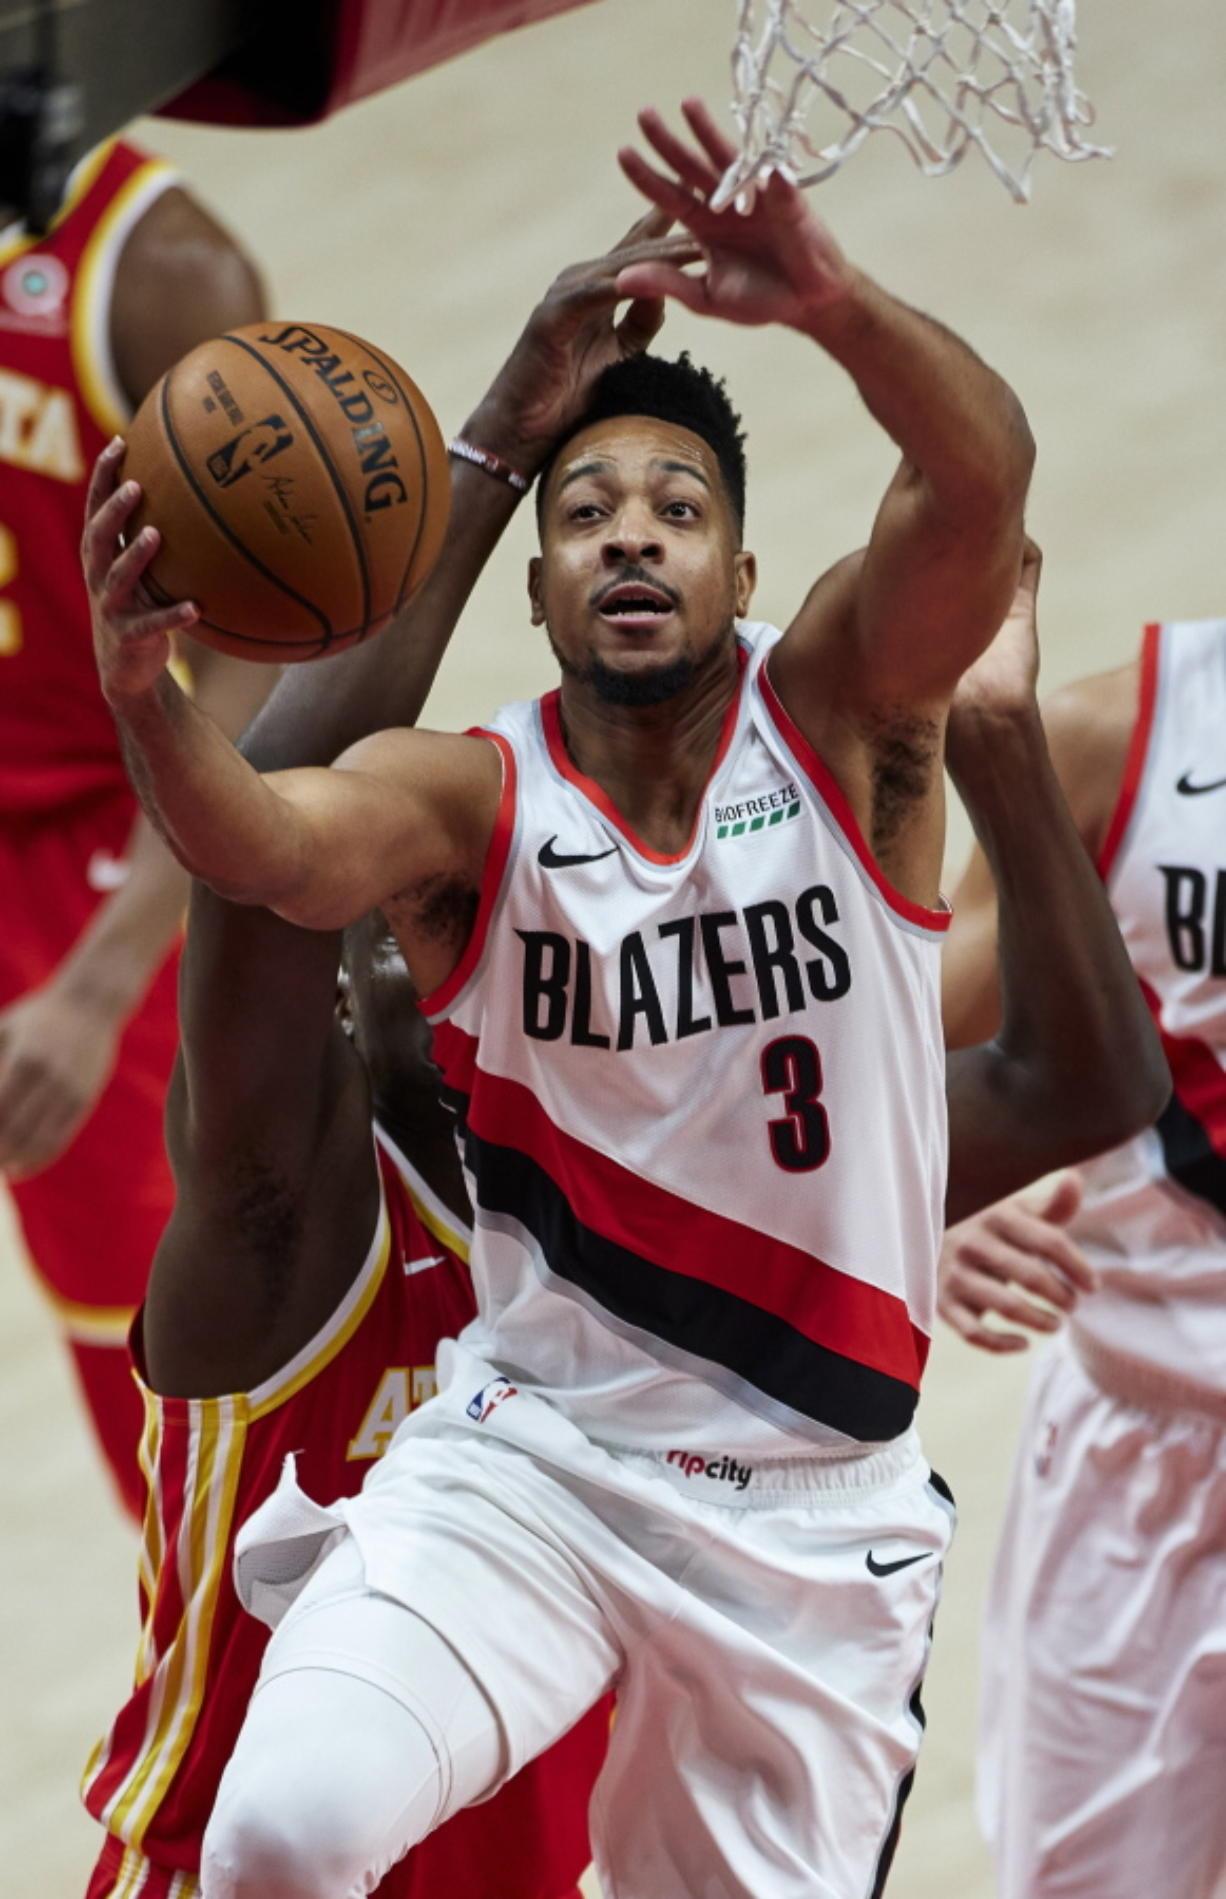 Portland Trail Blazers guard CJ McCollum shoots against the Atlanta Hawks during the first half of an NBA basketball game in Portland, Ore., Saturday, Jan. 16, 2021.